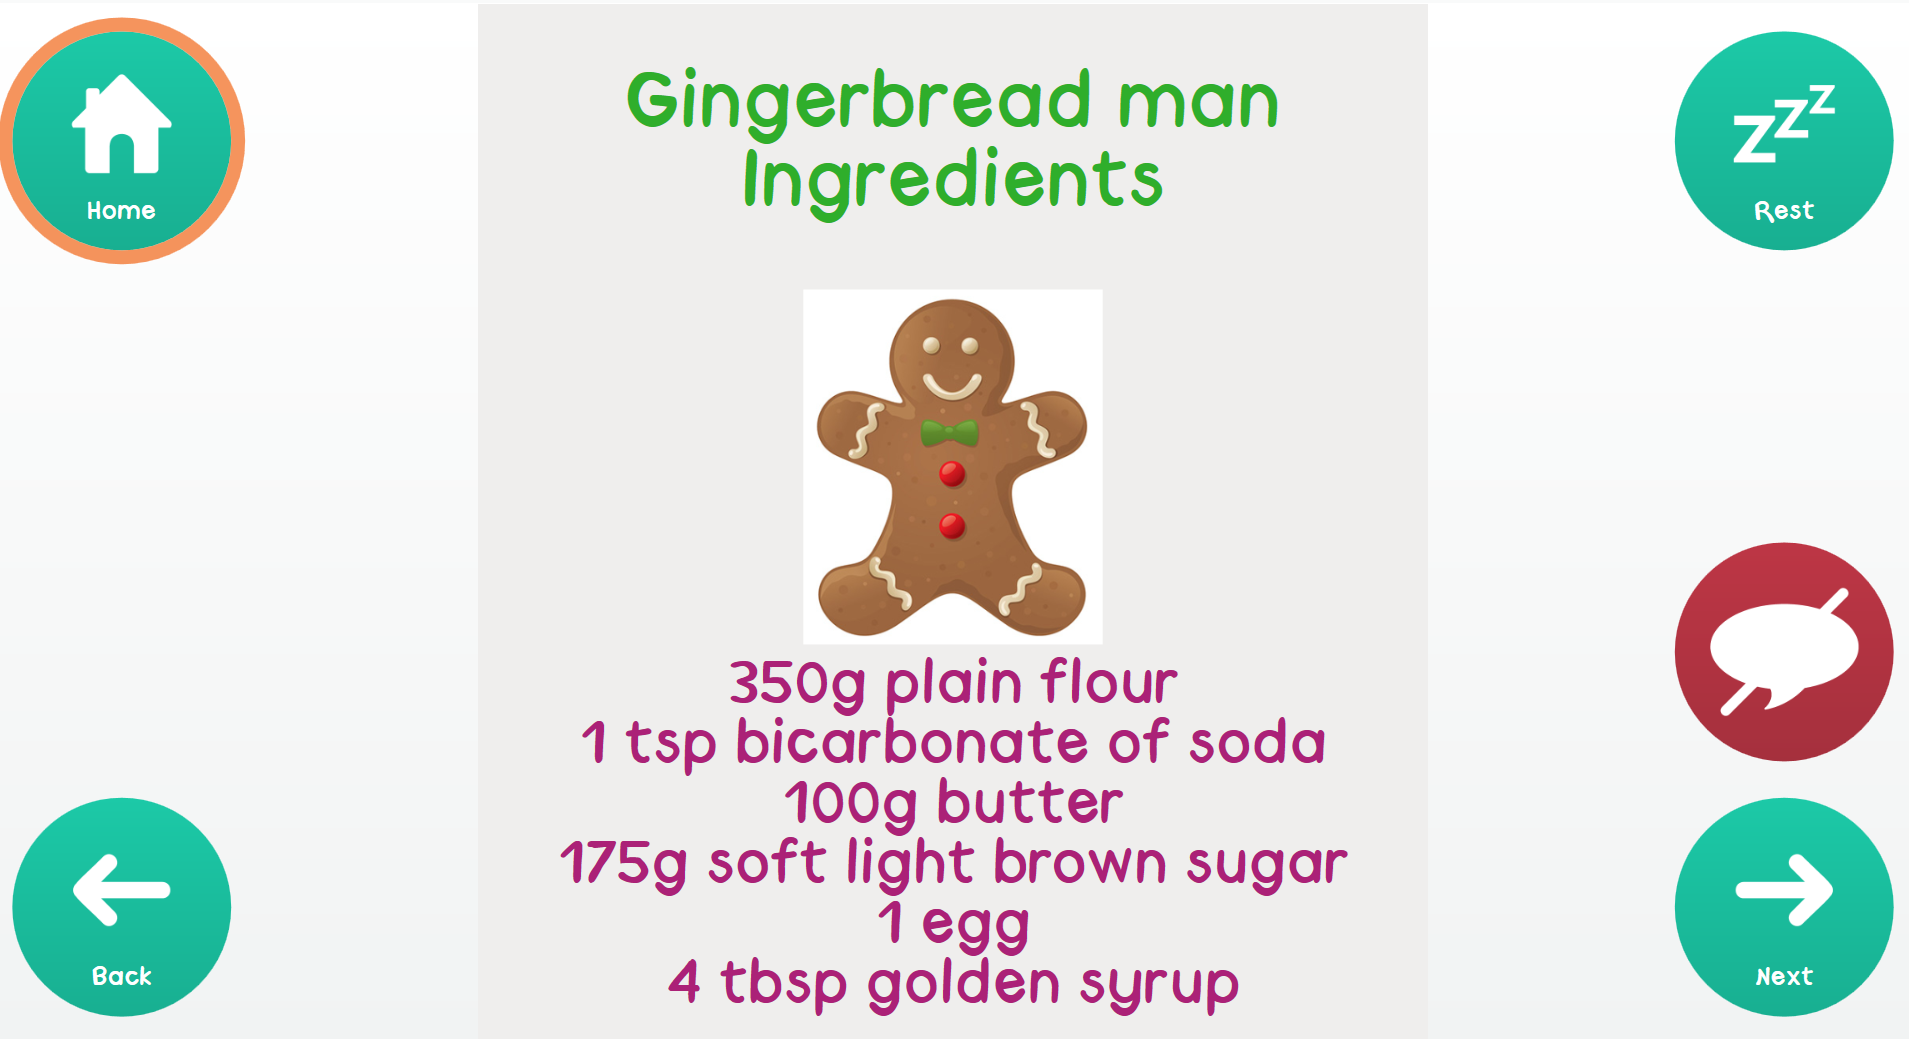 Gingerbread recipe grid